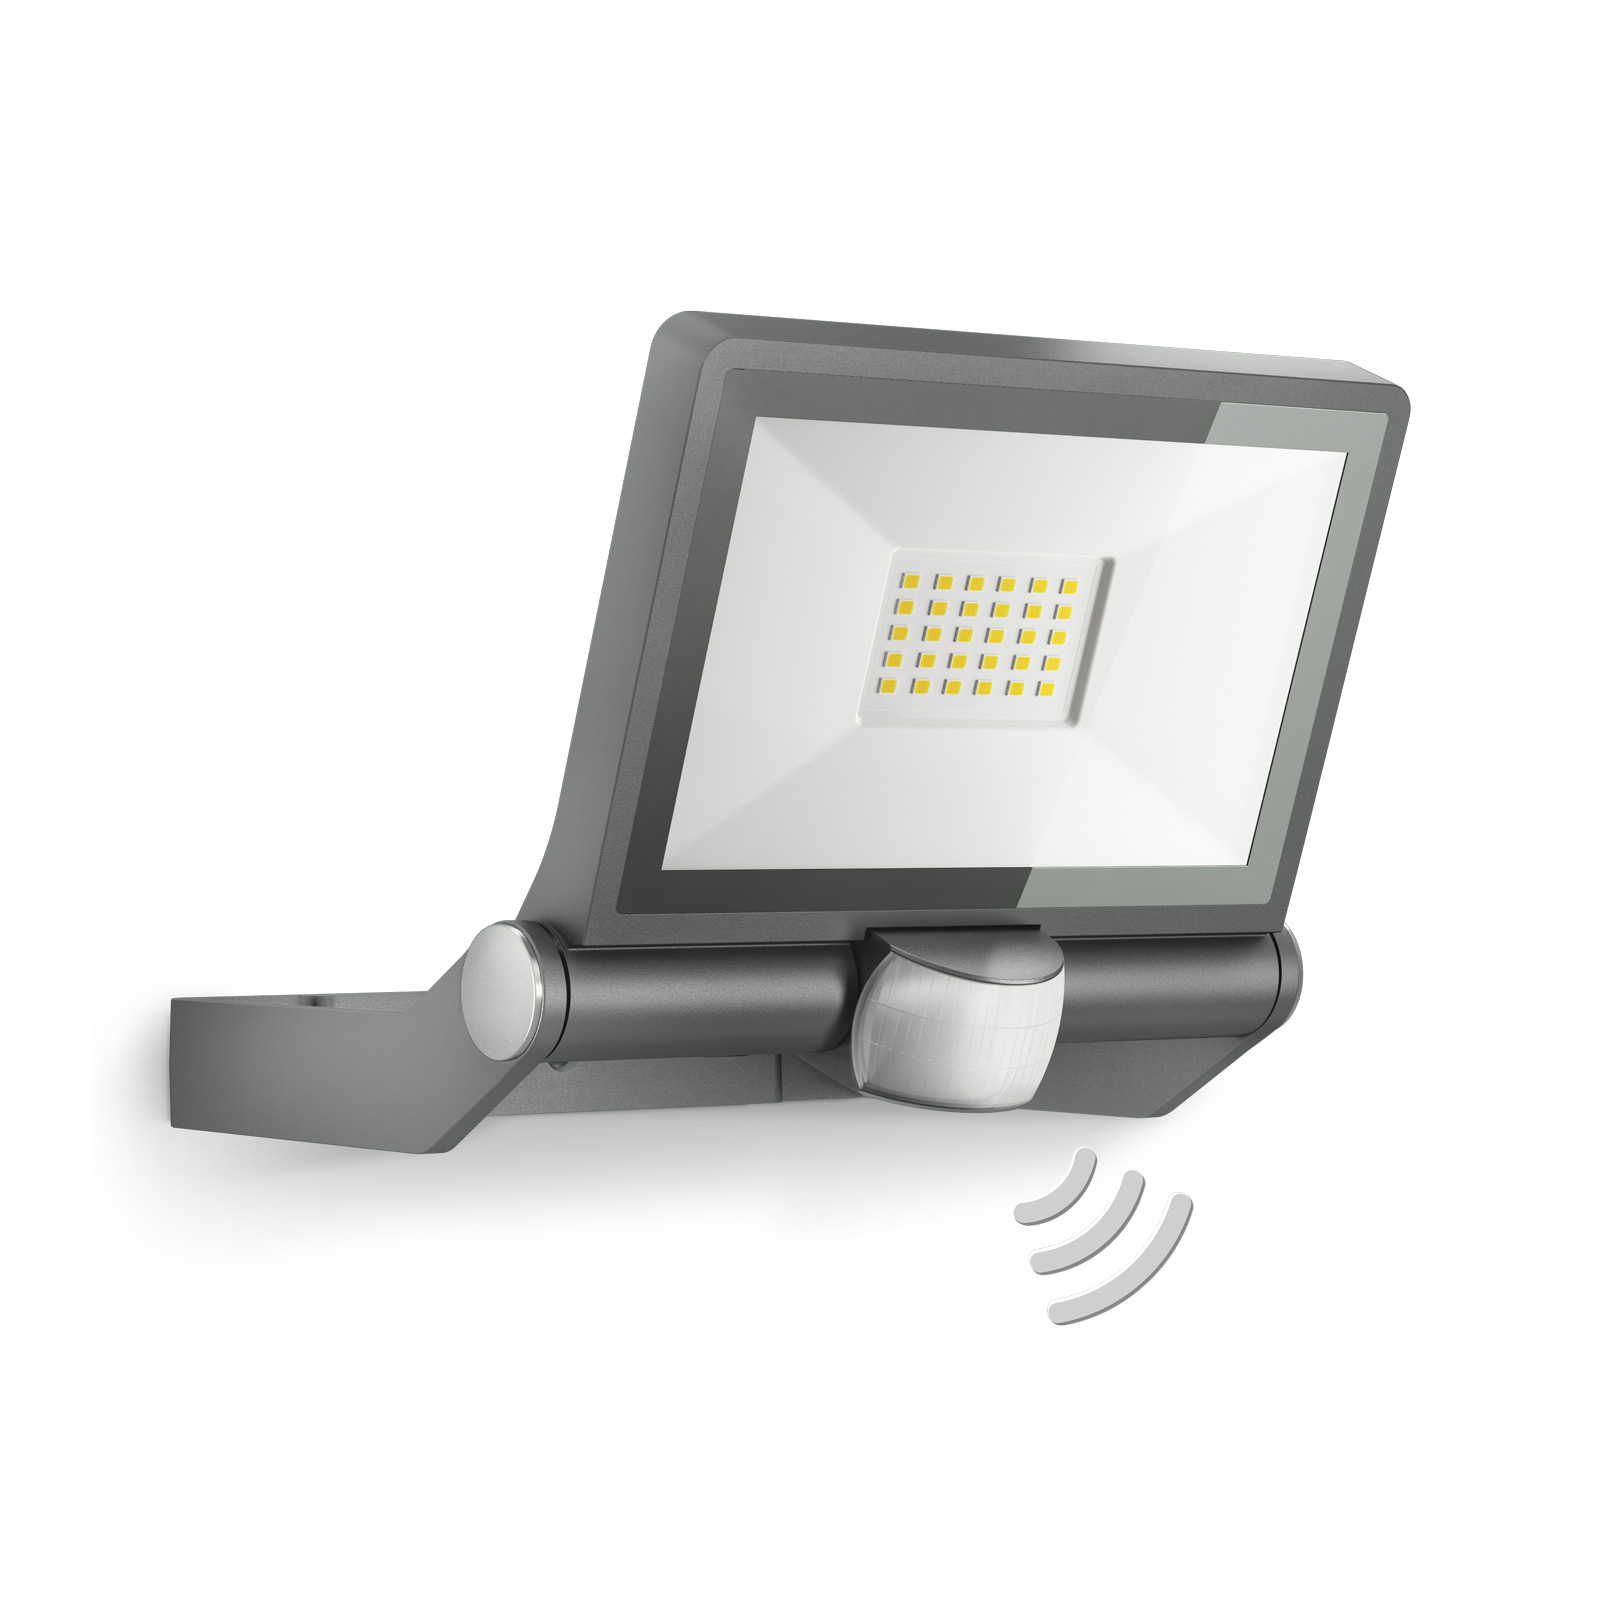 STEINEL XLED One sensor spotlight 180° pivotable_8505794_1